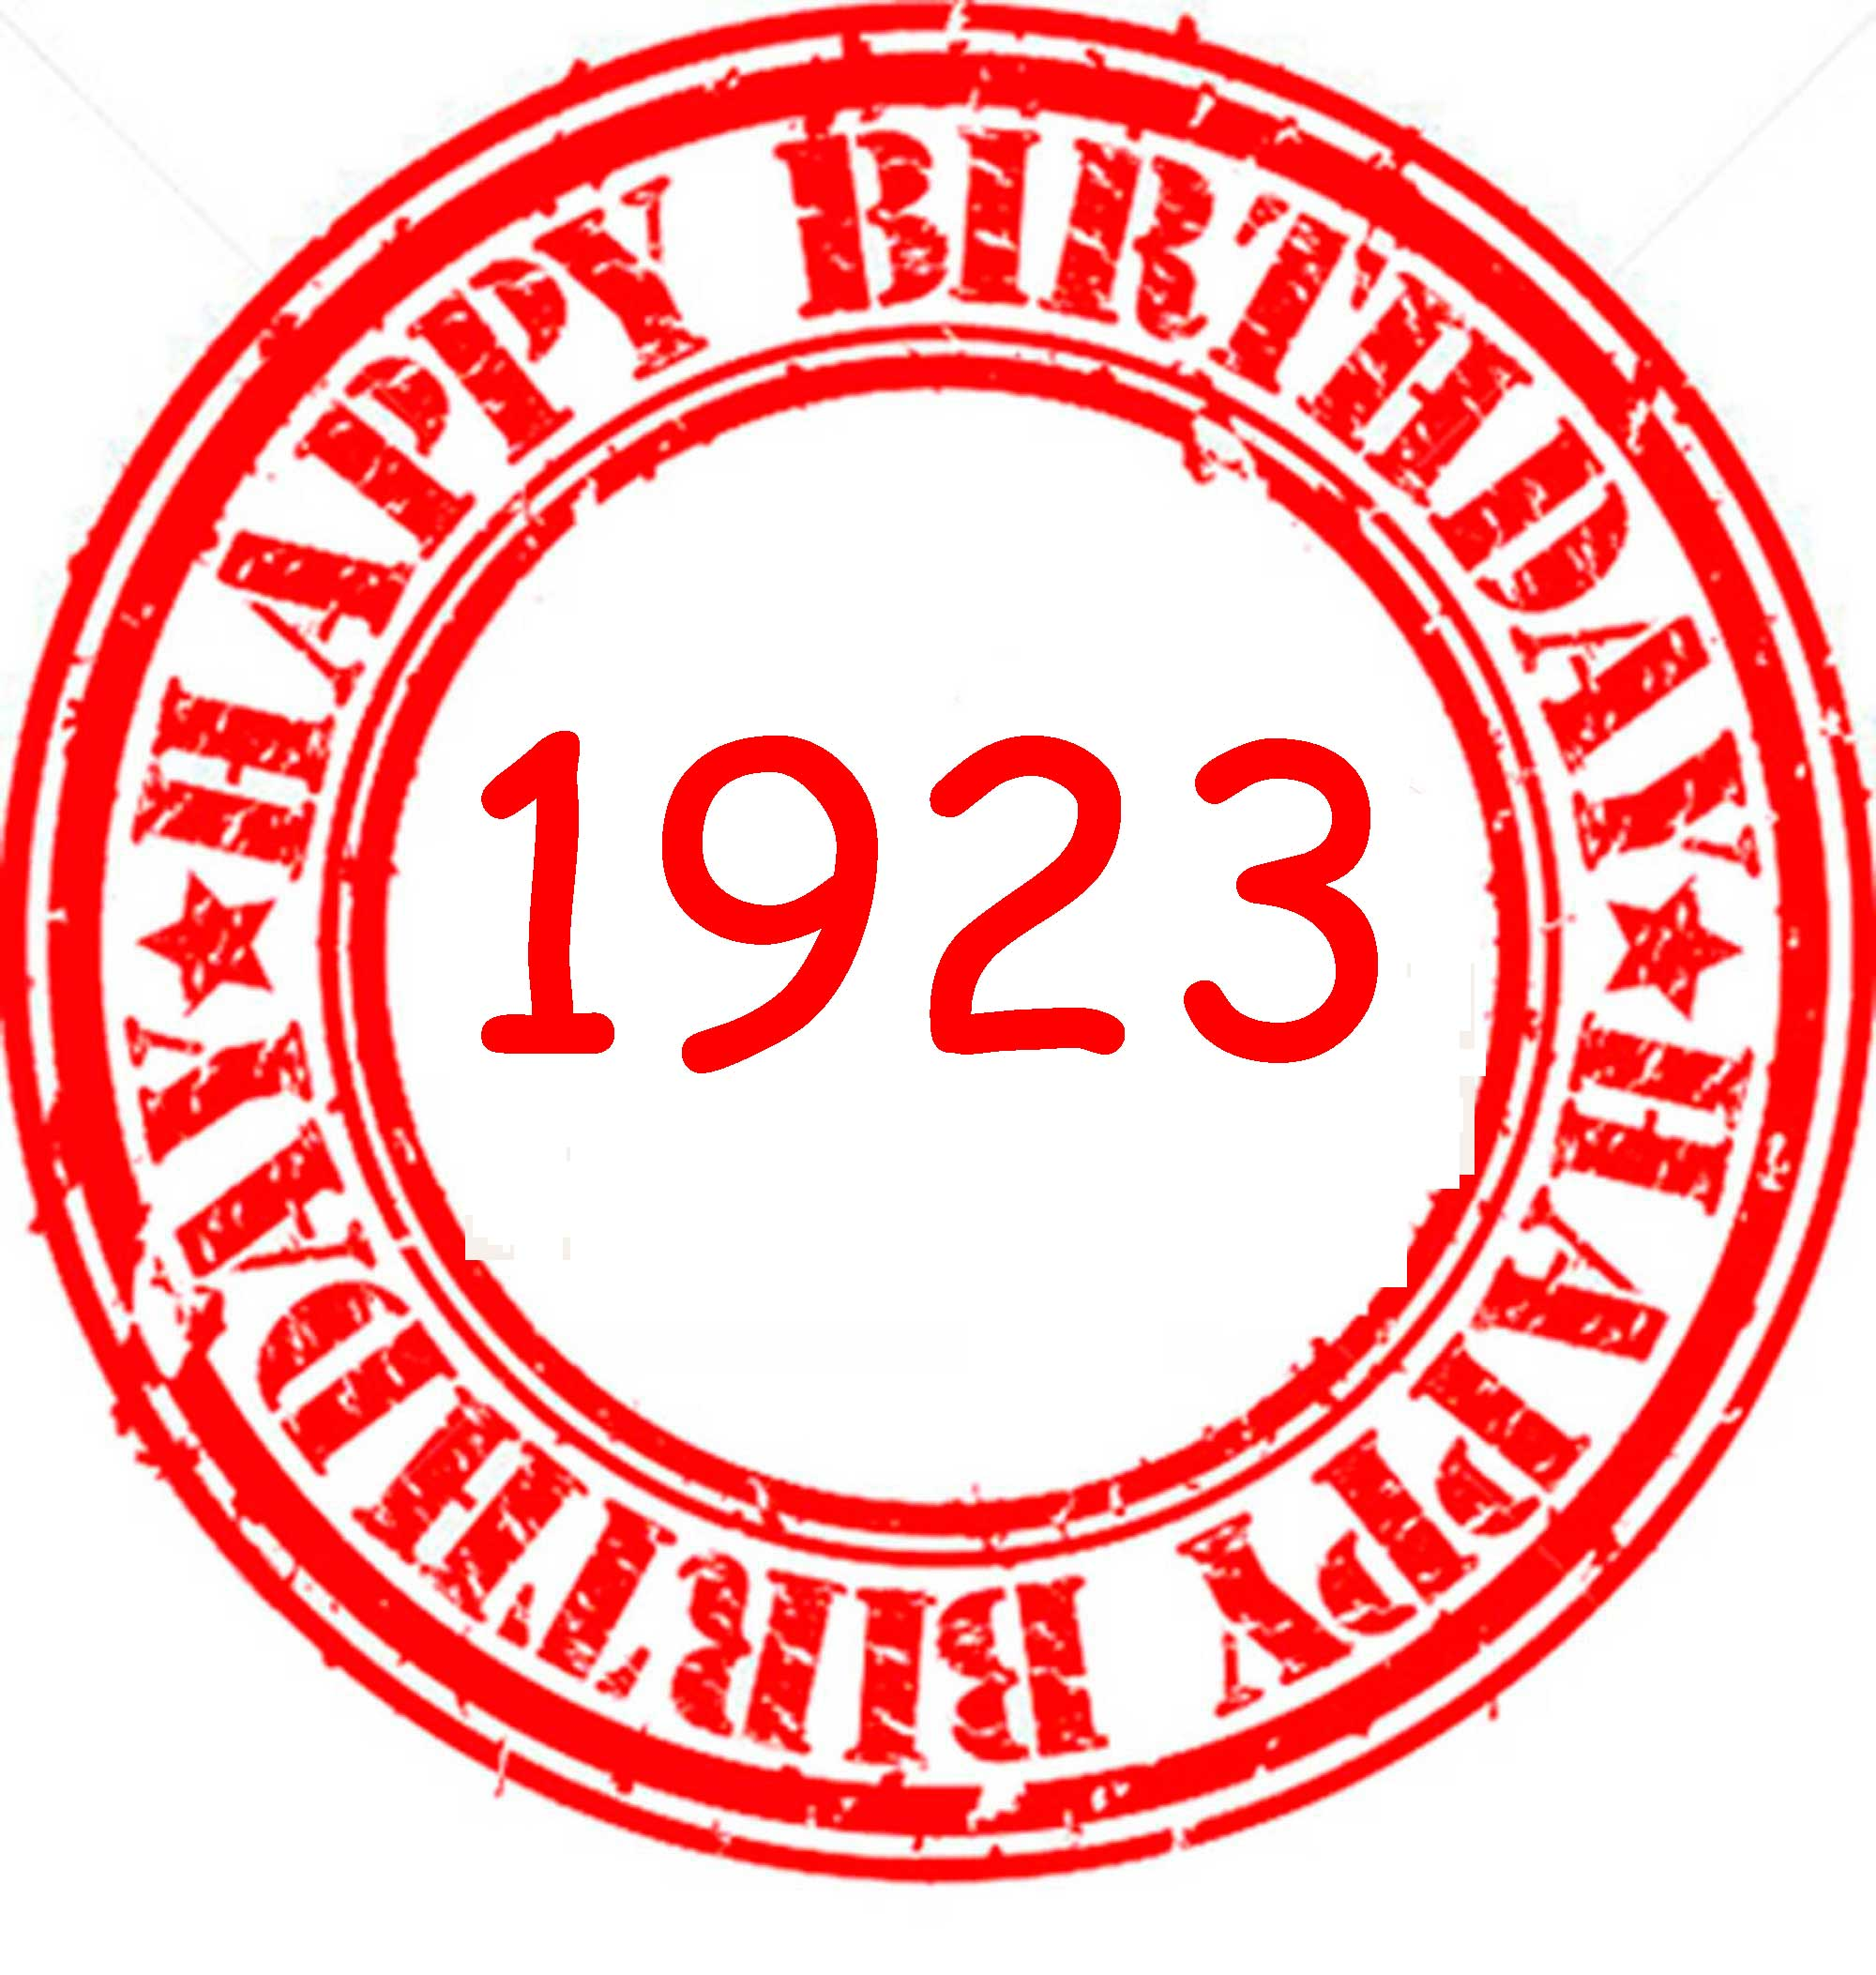 Happy Birthday 1923